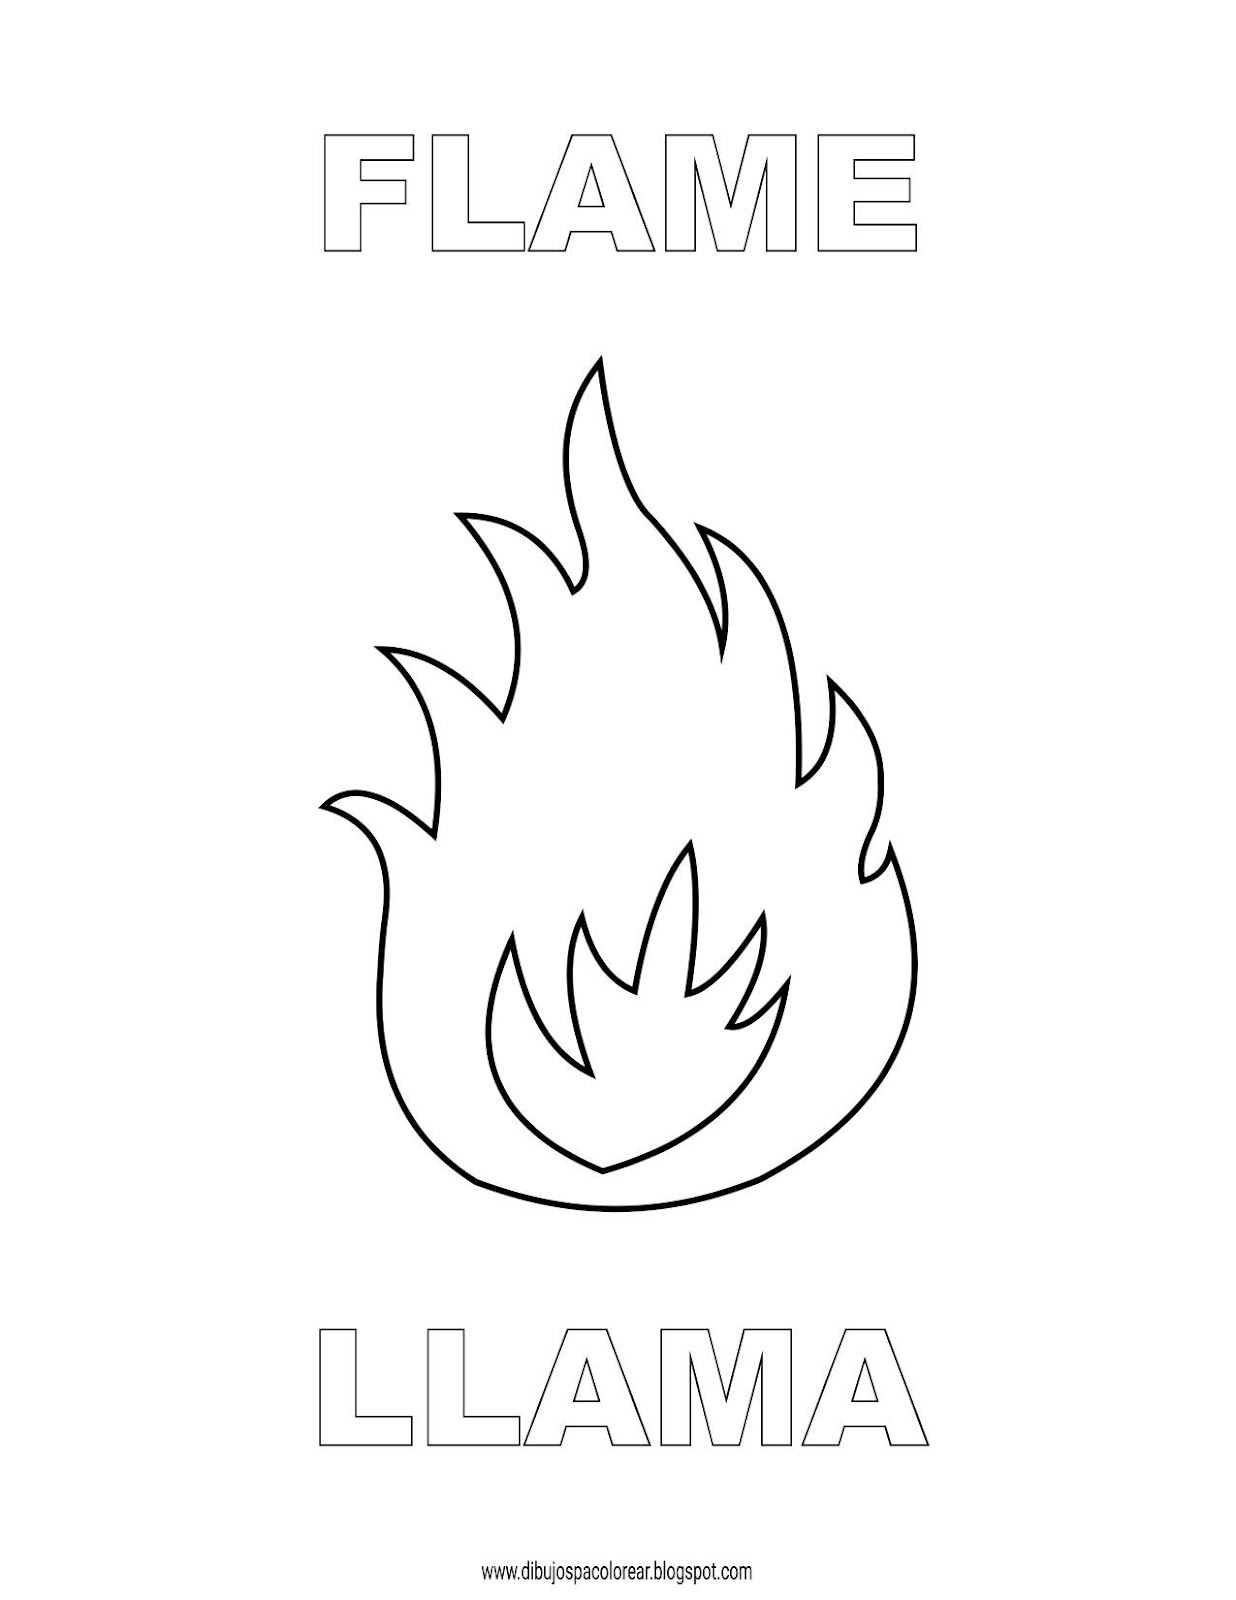 Dibujos Inglés Español Con Ll Llama Flame